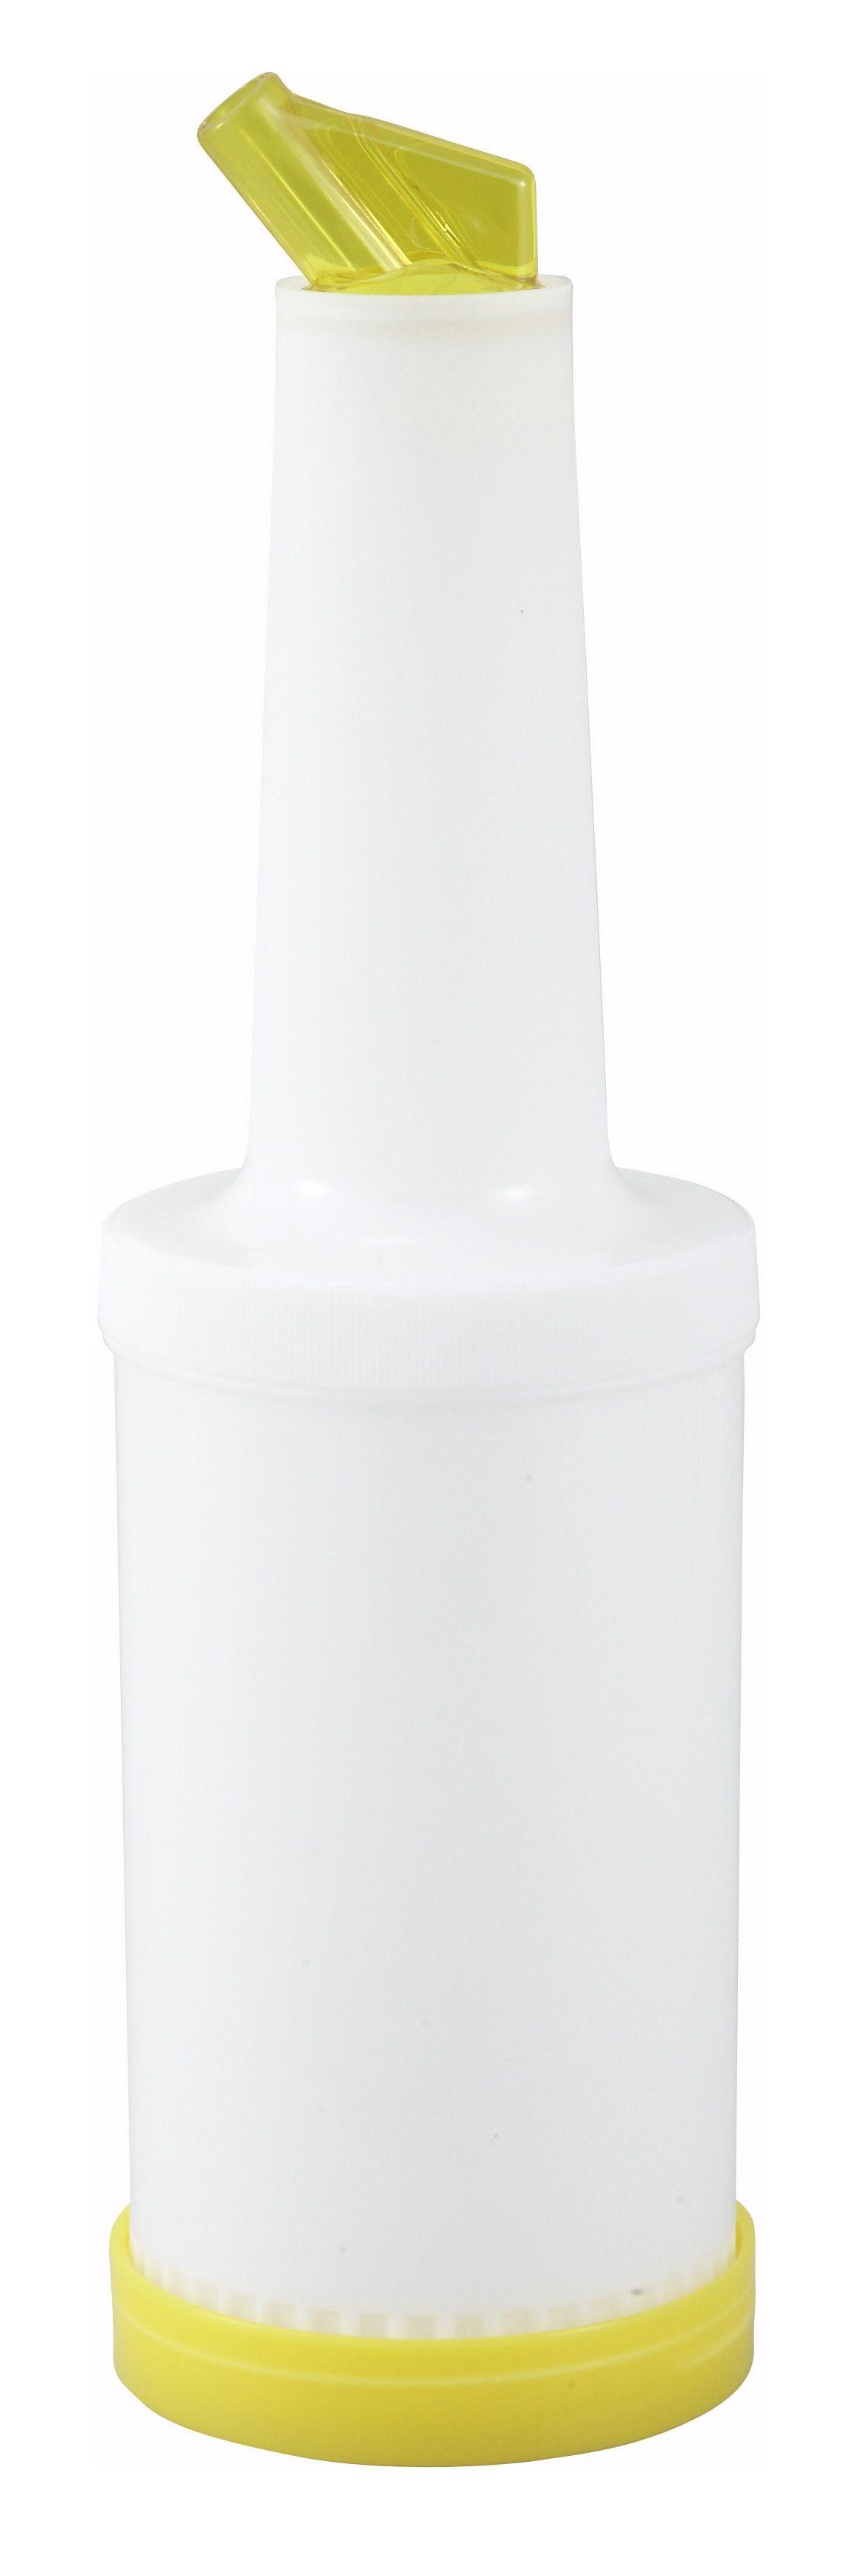 Winco PPB-2Y Liquor and Juice Multi-Pour Bottle with Yellow Spout and Lid 2 Qt.